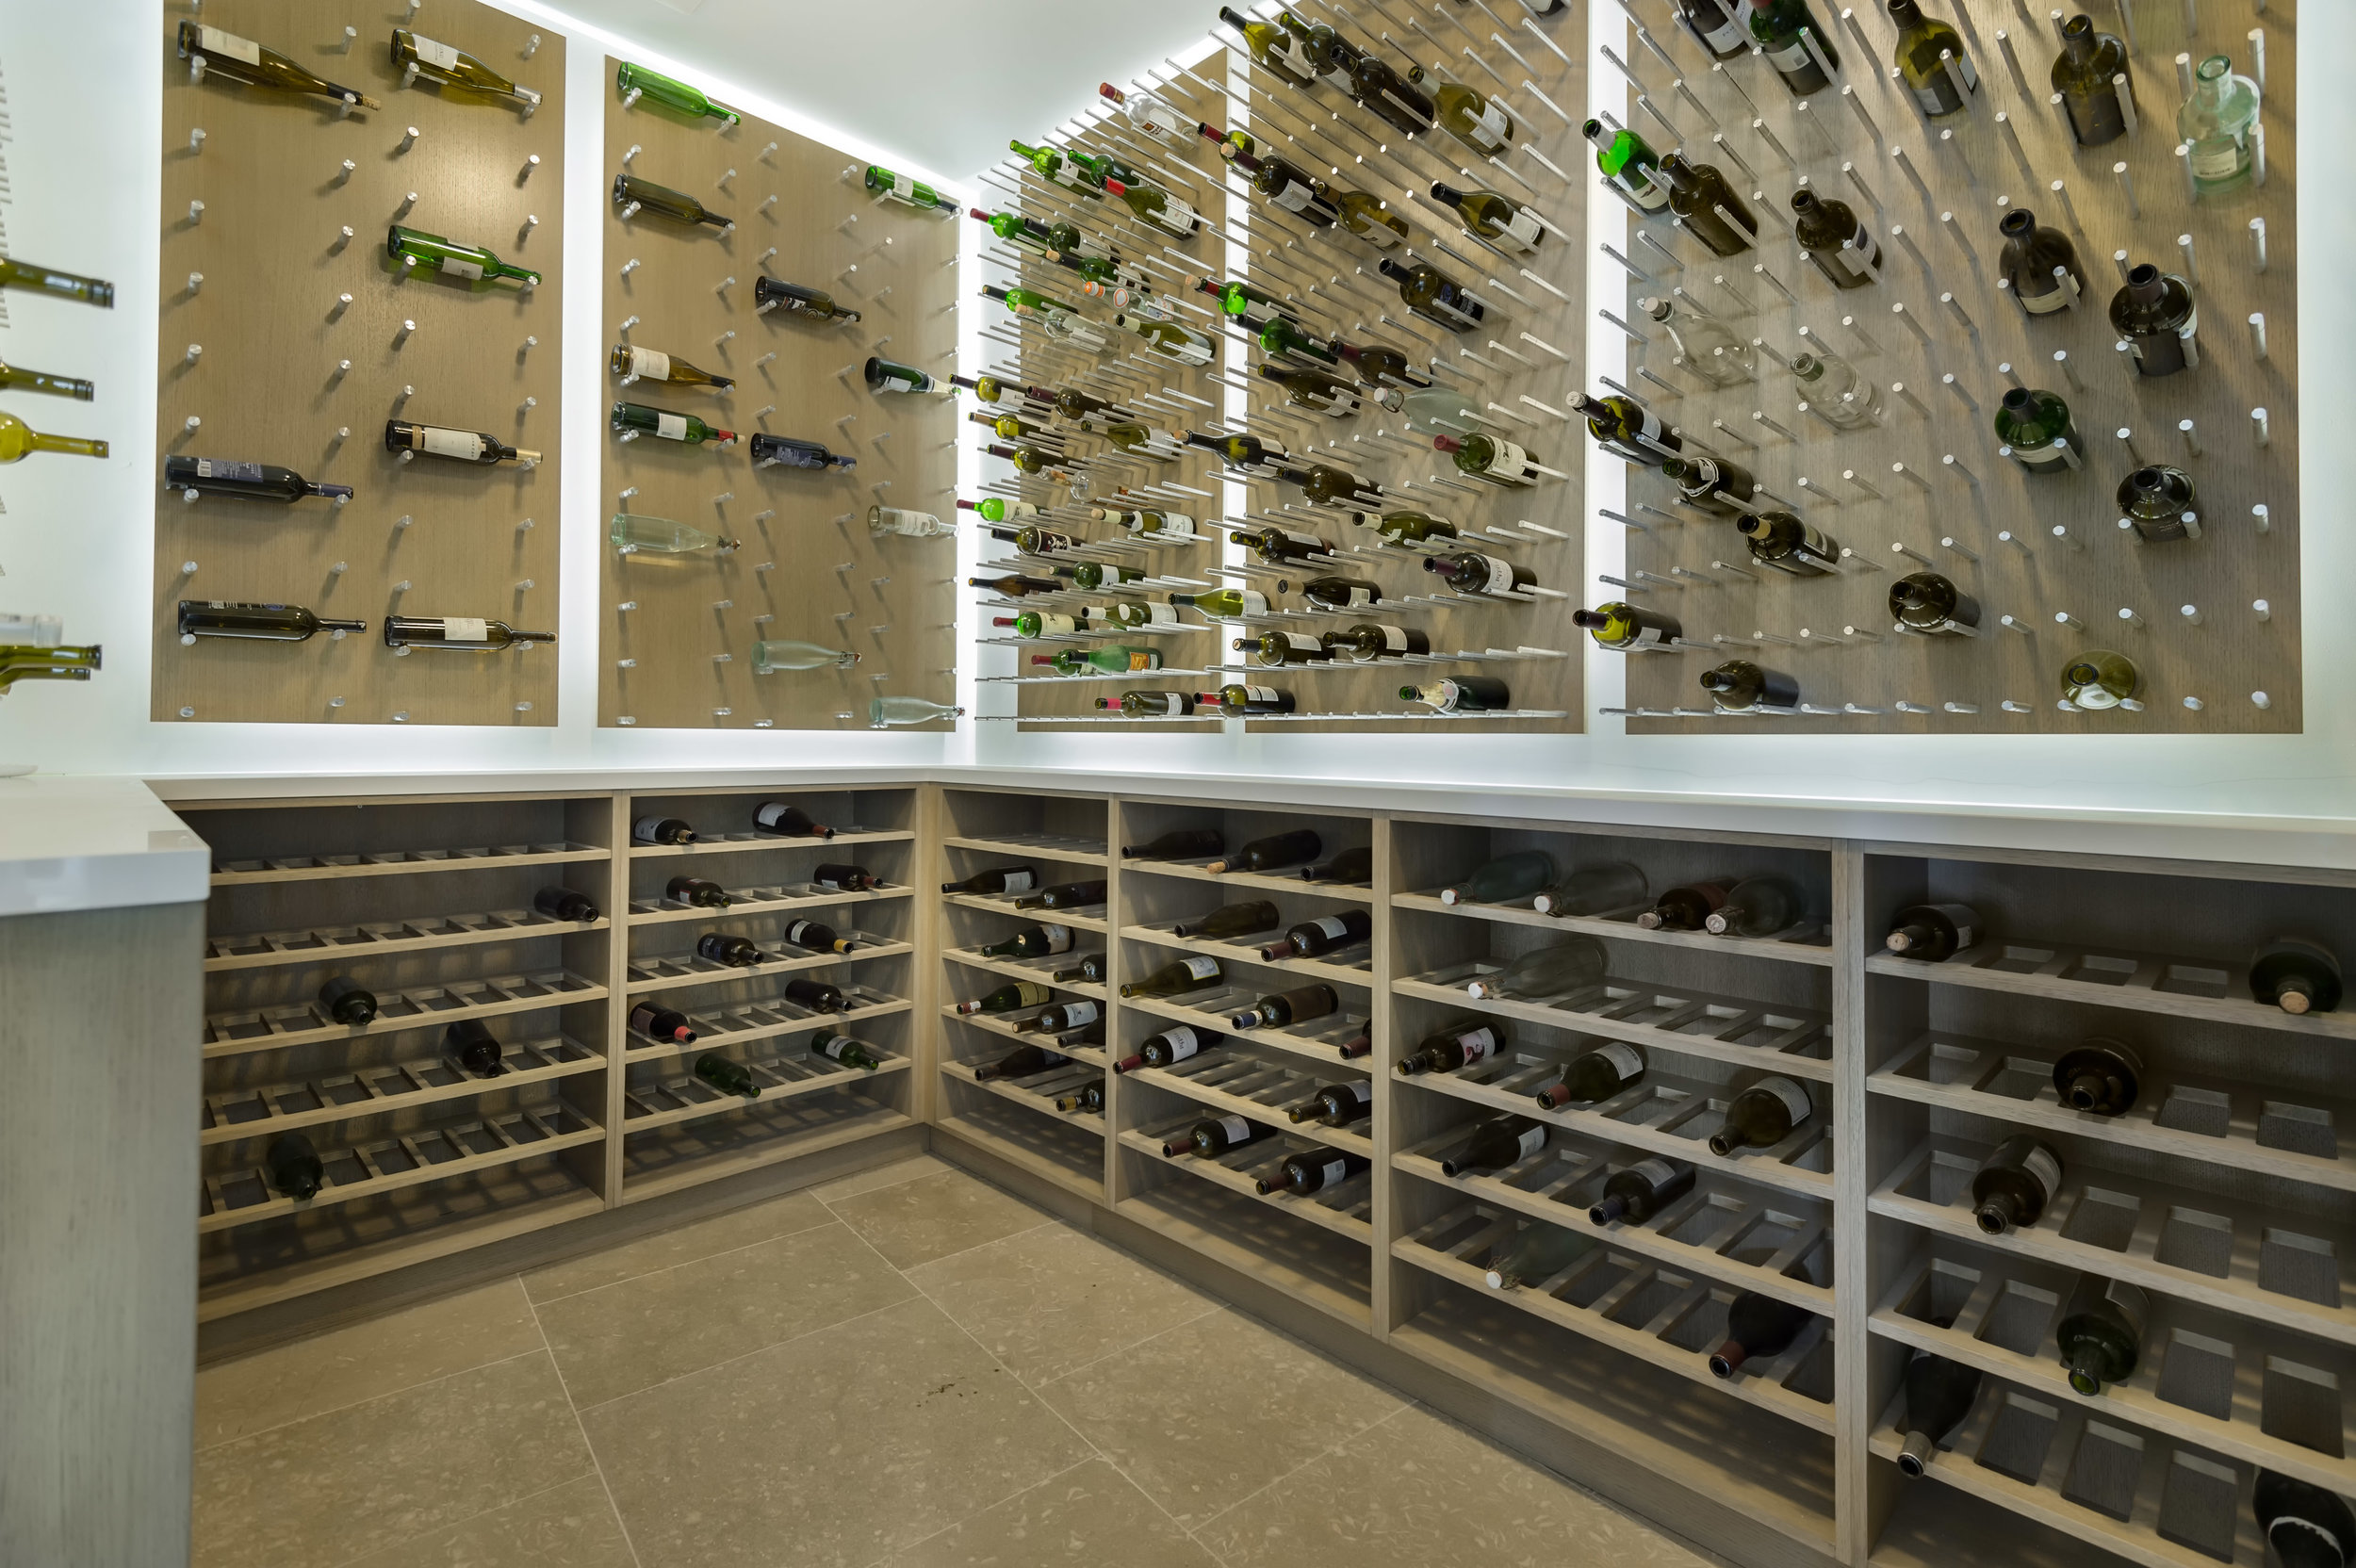 020 wine closet 11902 Ellice Street Malibu For Sale The Malibu Life Team Luxury Real Estate.jpg